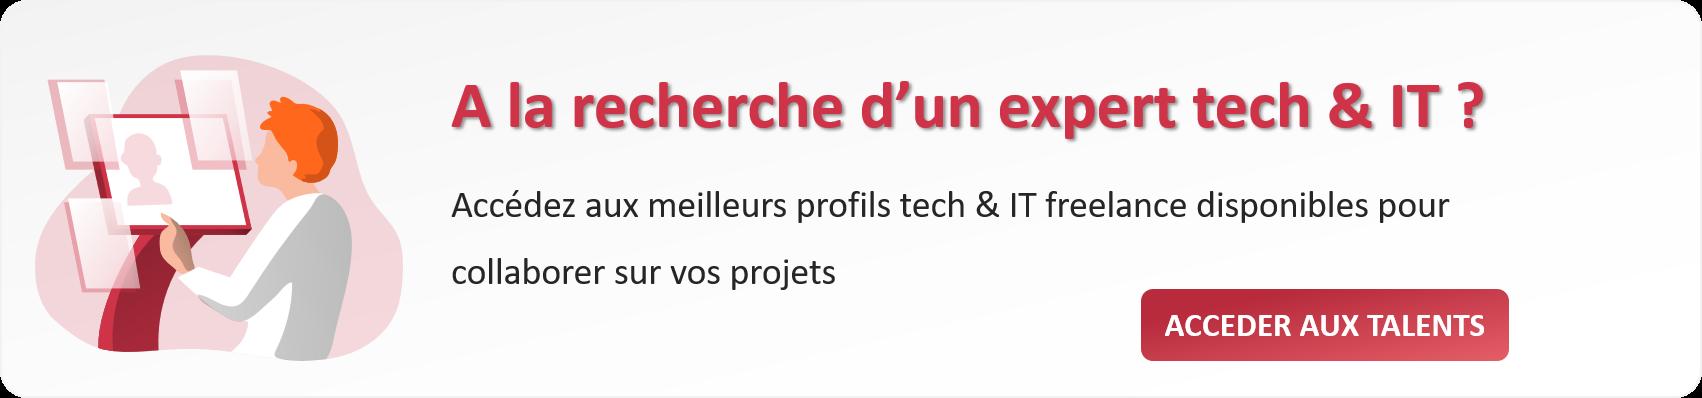 A la recherche d'un expert tech & IT